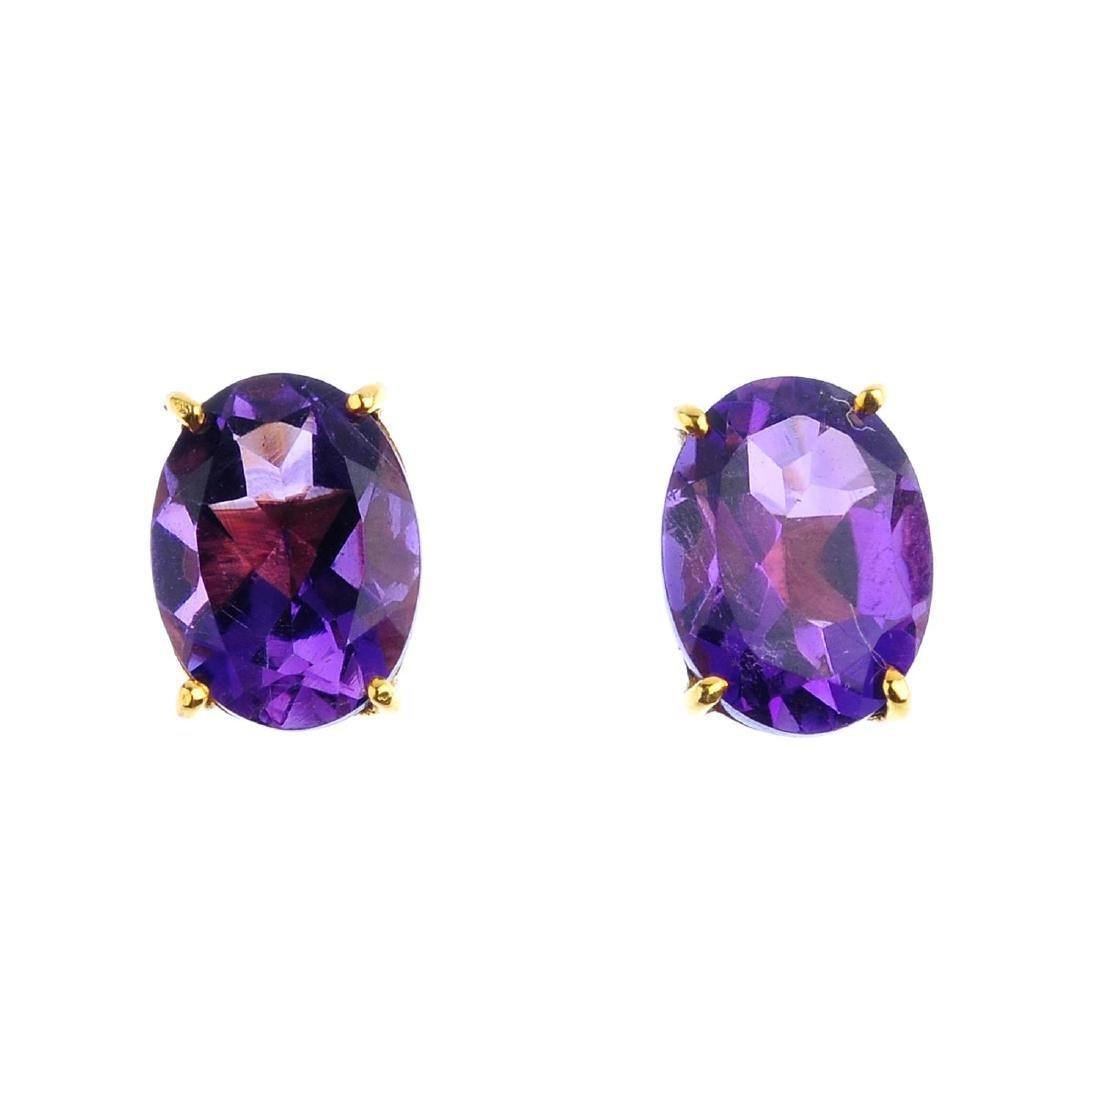 A pair of oval-shape amethyst stud earrings. Length